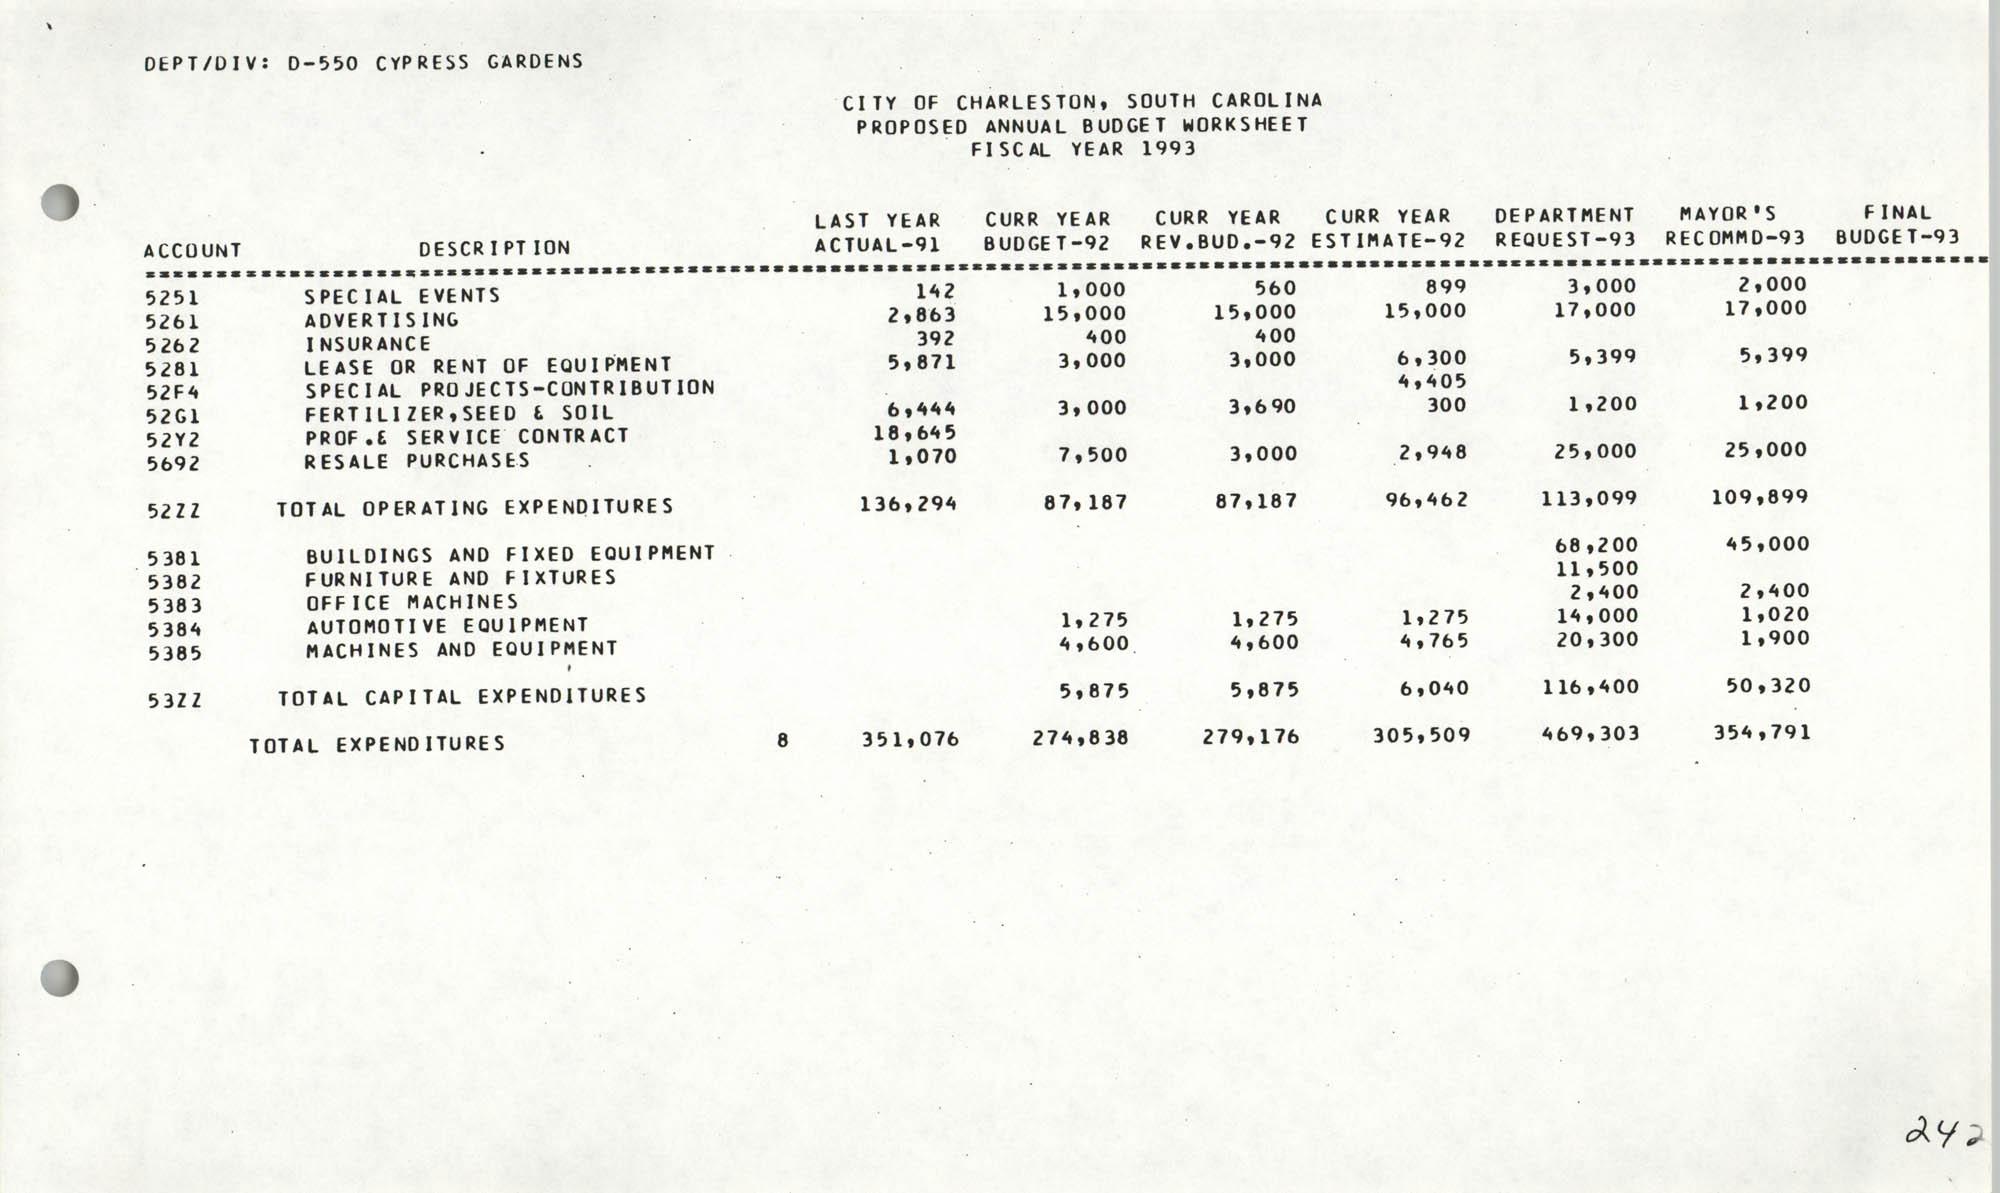 The City Council of Charleston, South Carolina, 1993 Budget, Page 242